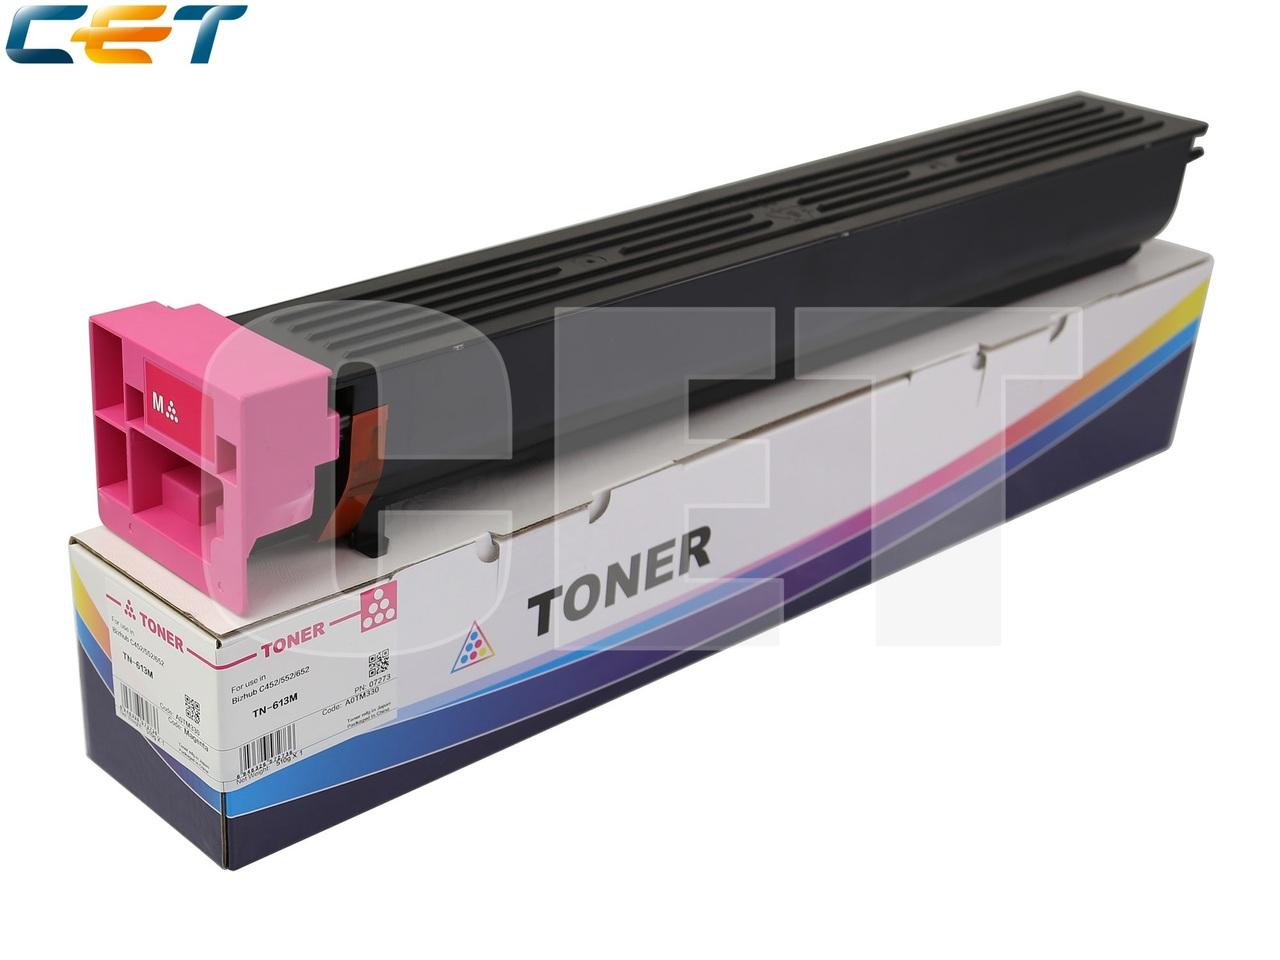 Тонер-картридж TN-613M для KONICA MINOLTA BizhubC452/C552/C652 (CET) Magenta, 510г, 30000 стр., CET7273